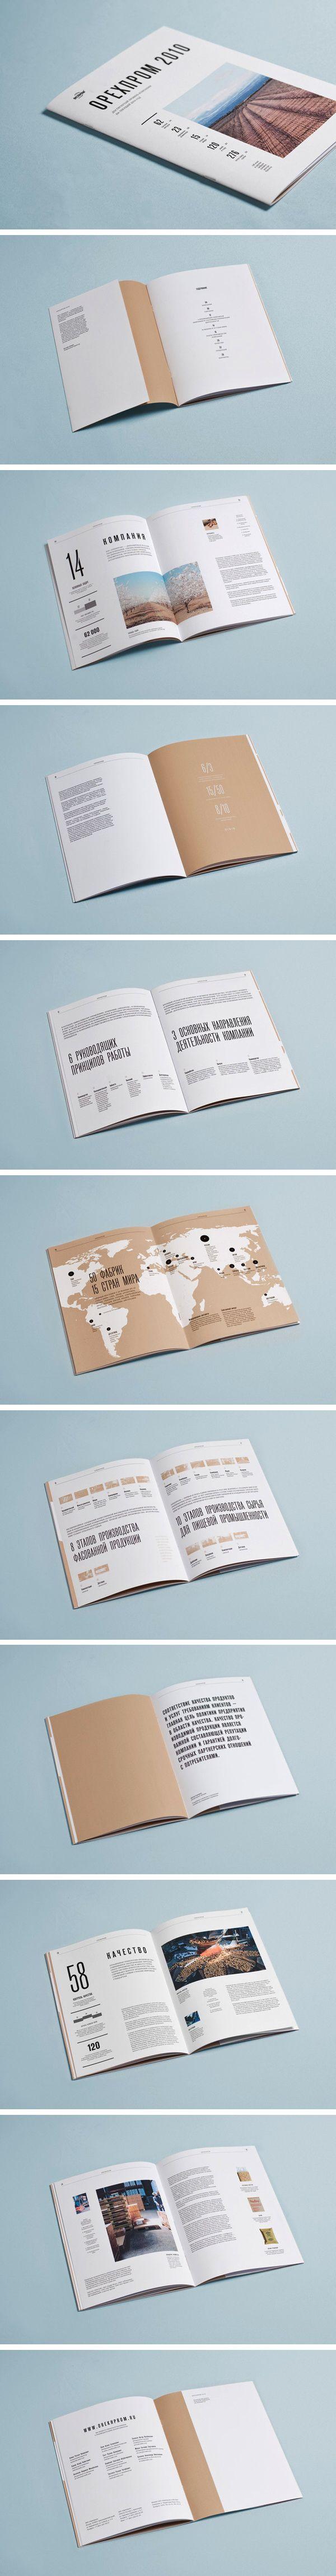 Interesante proyecto #design #layout   Editorial Design   Pinterest ...